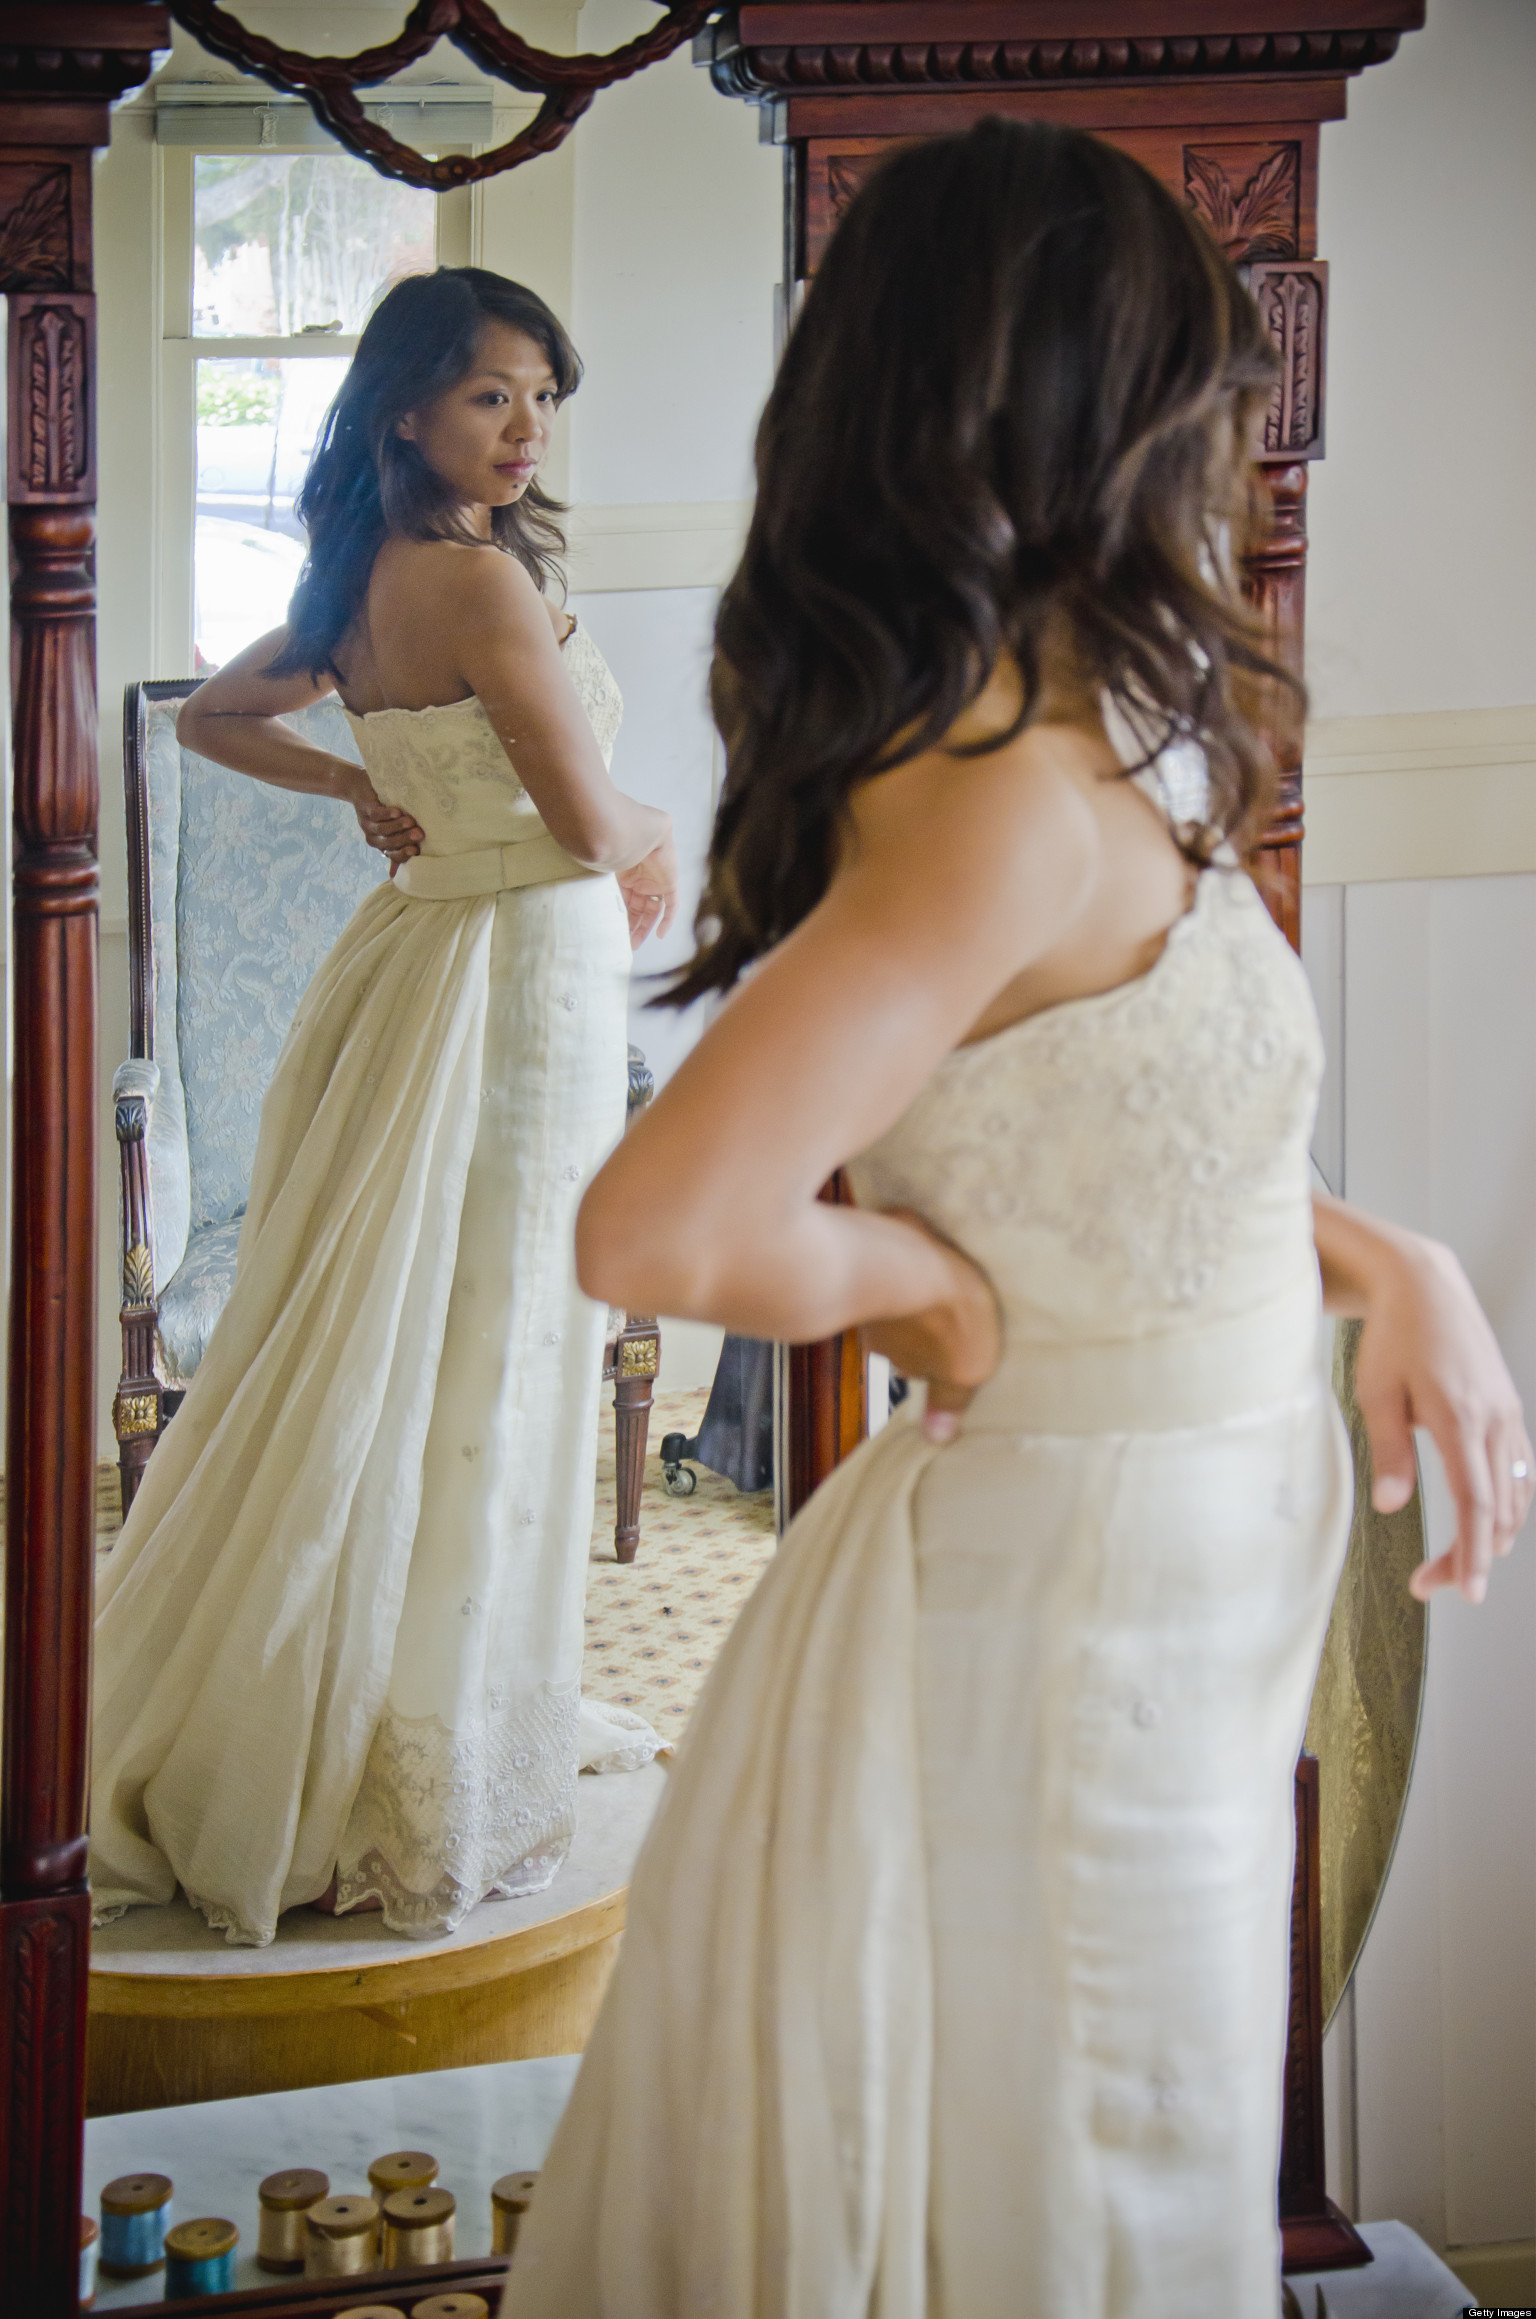 Wedding Dress Shopping: When To Say \'No\'   HuffPost